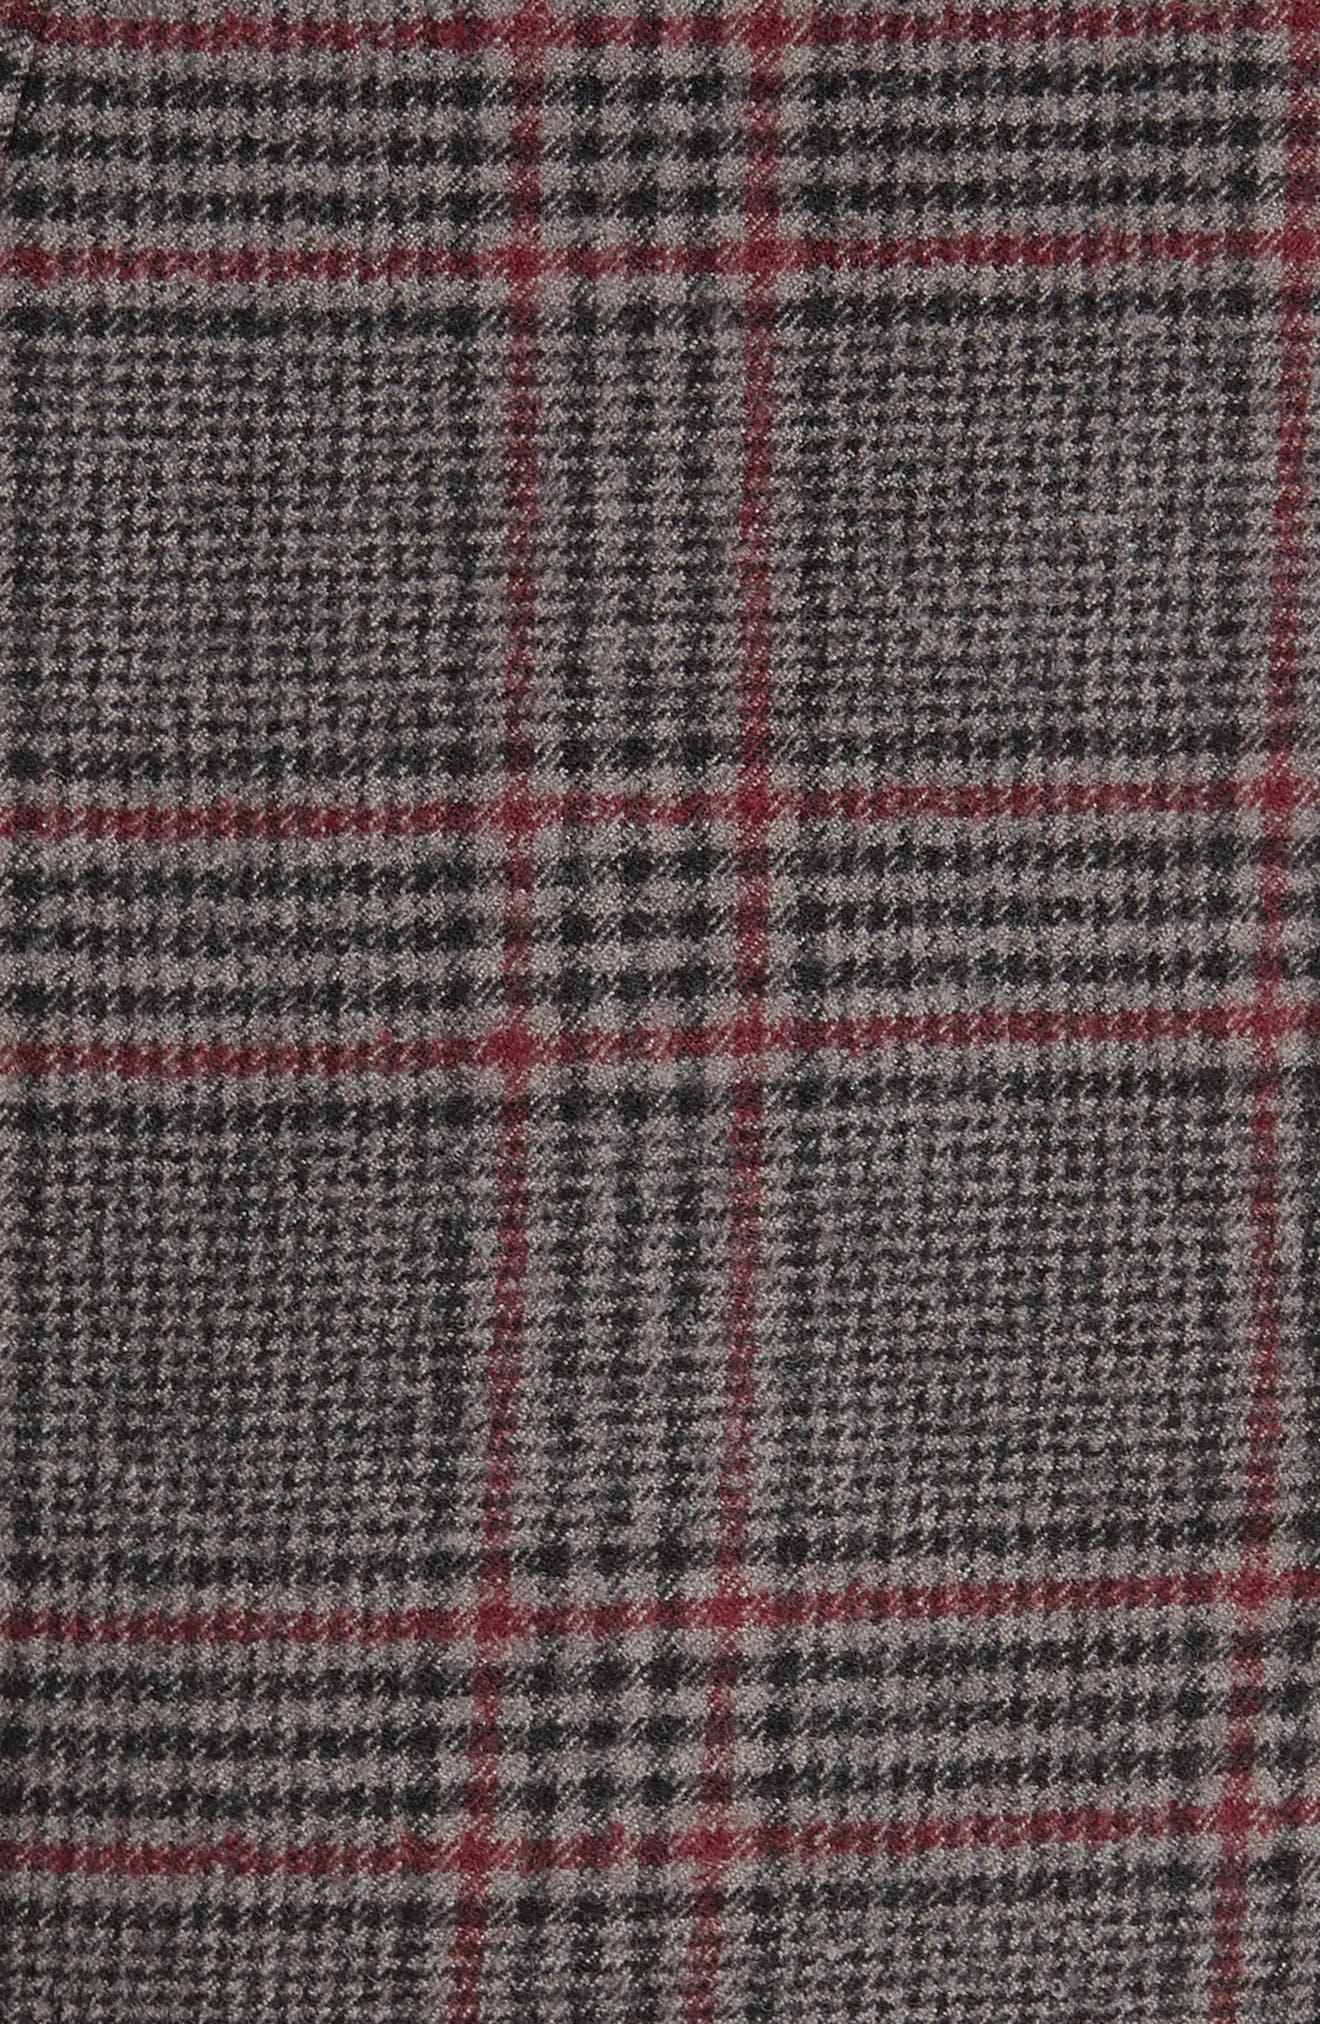 MICHAEL KORS,                             Plaid Stretch Wool Flannel Pants,                             Alternate thumbnail 5, color,                             034